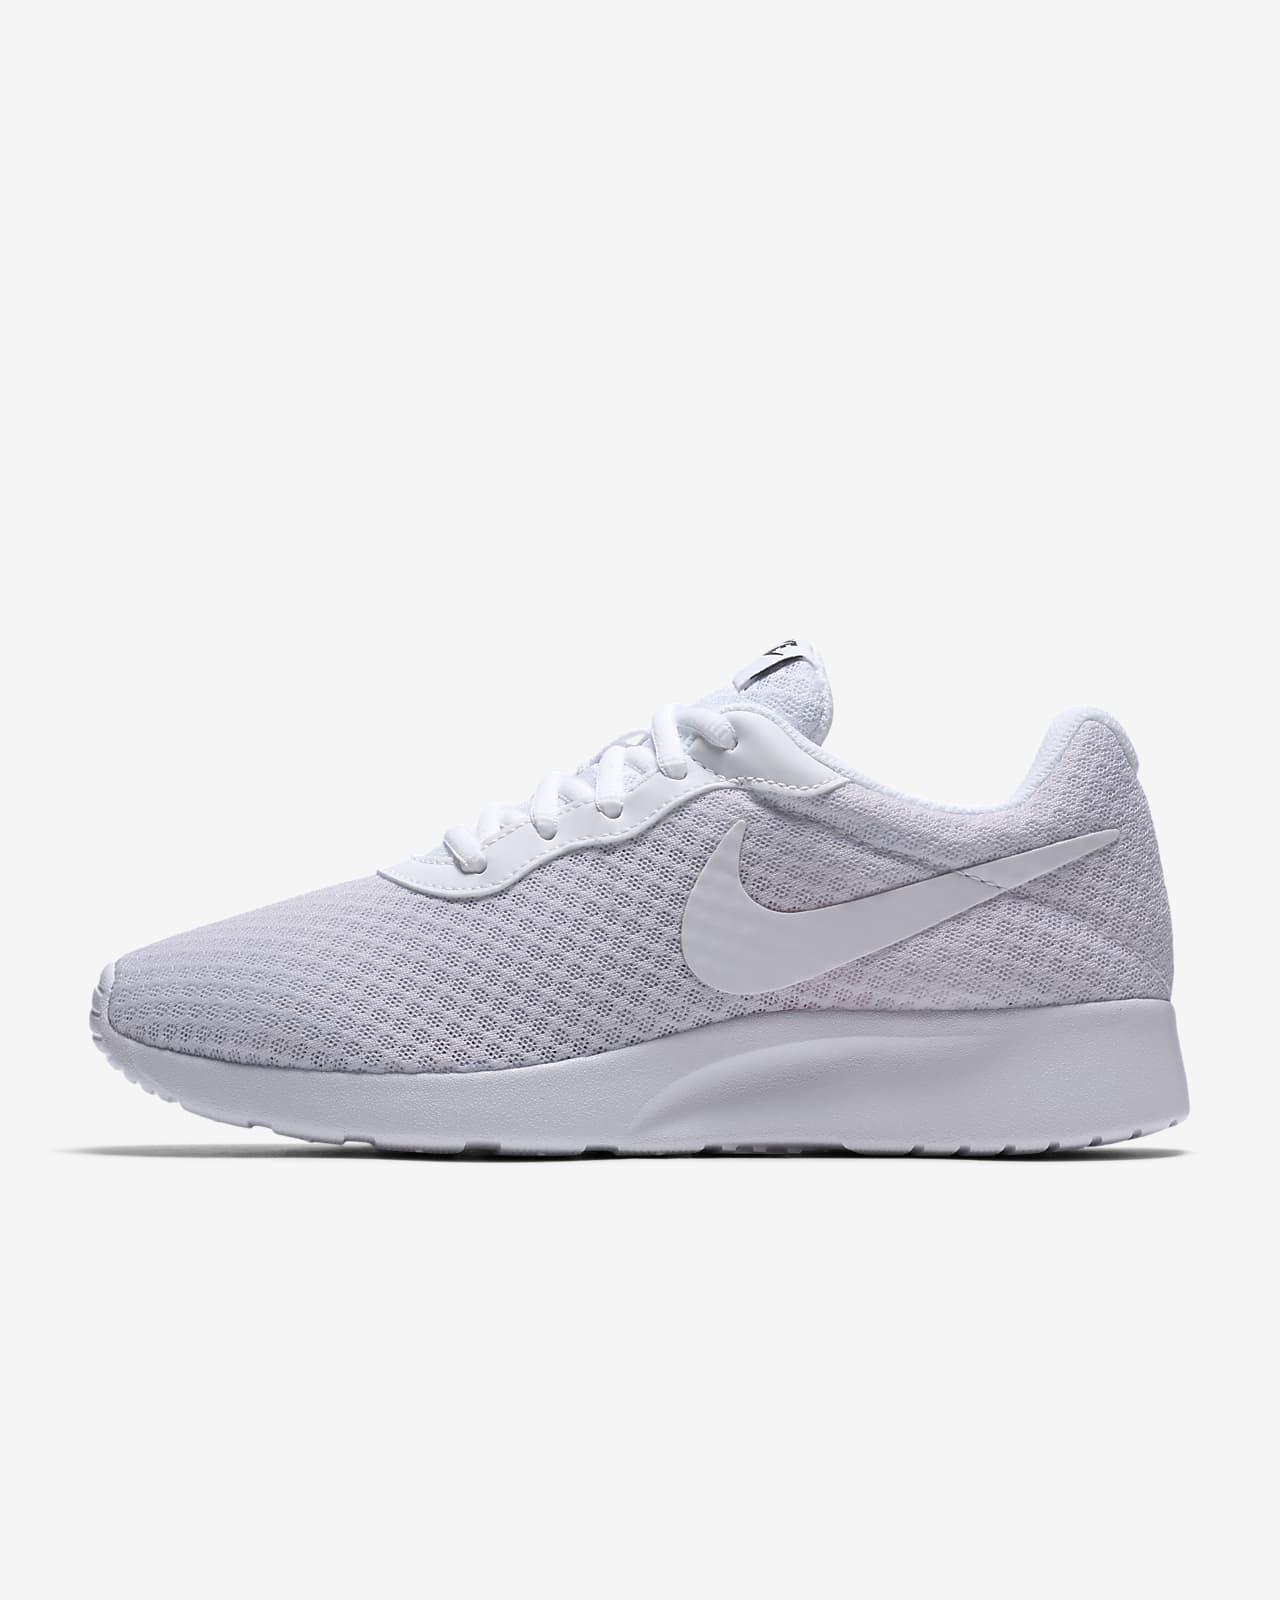 Chaussure Nike Tanjun pour Femme. Nike LU